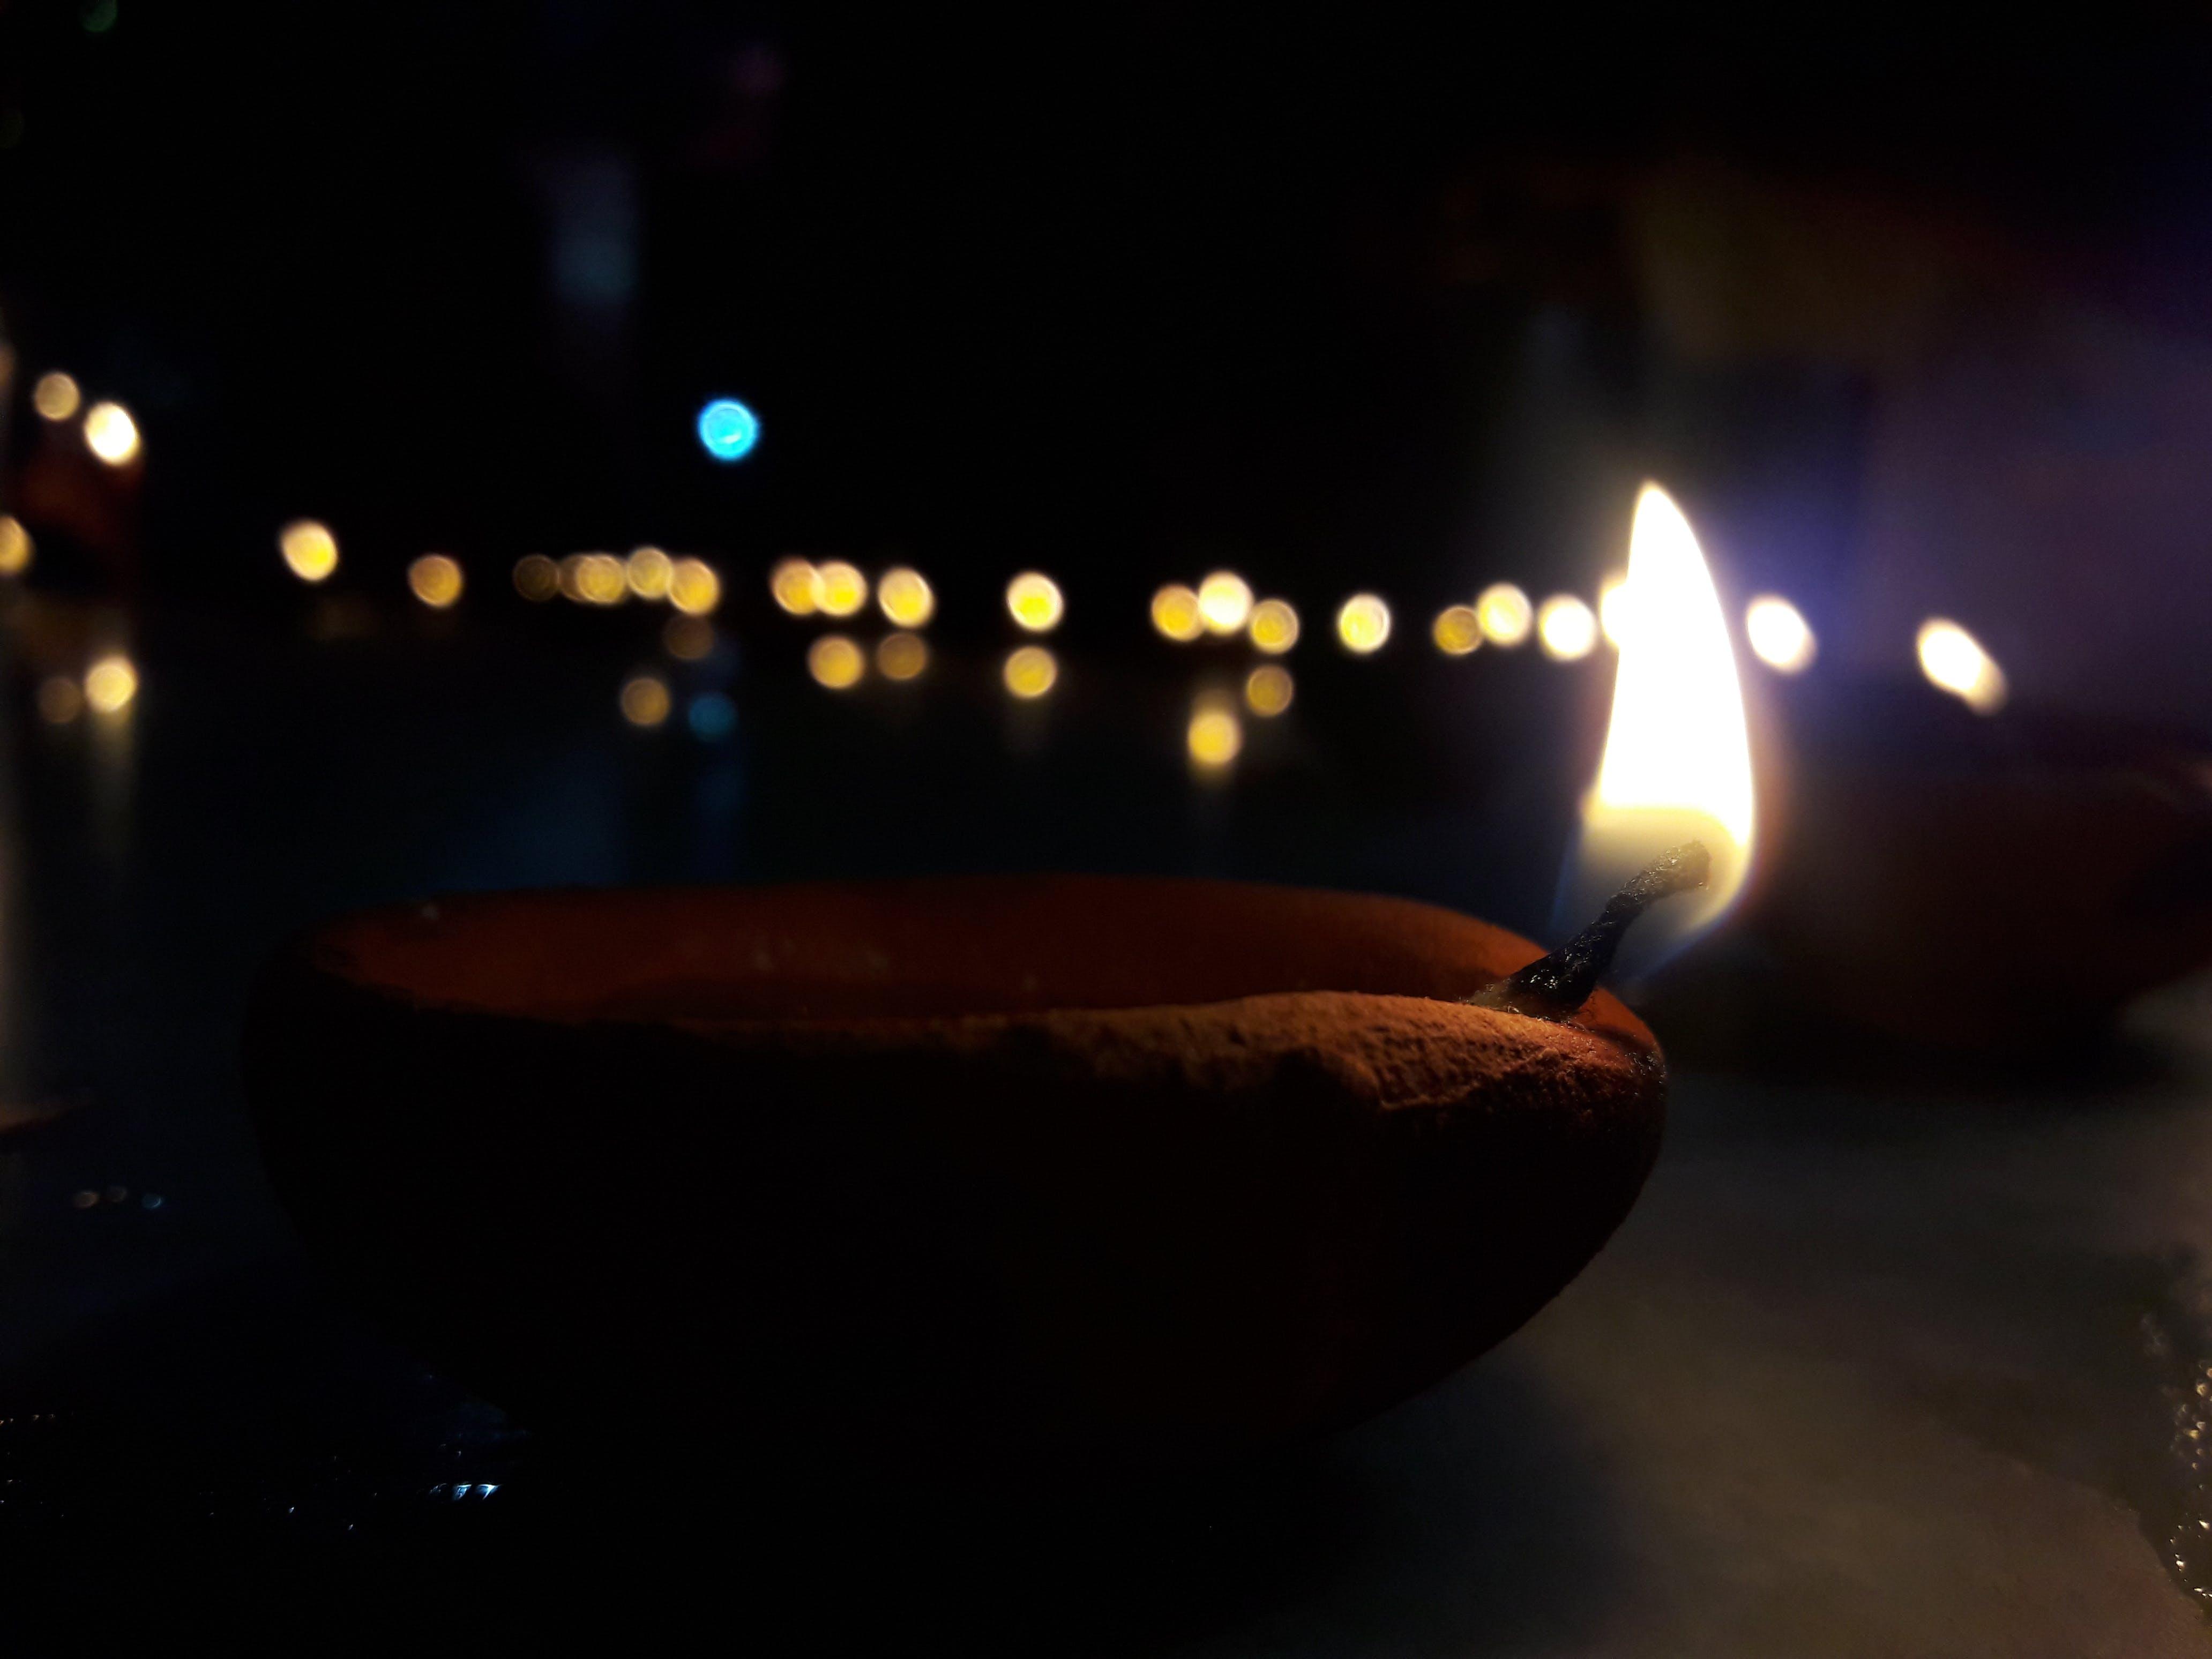 Free stock photo of Diwali vibes❤️